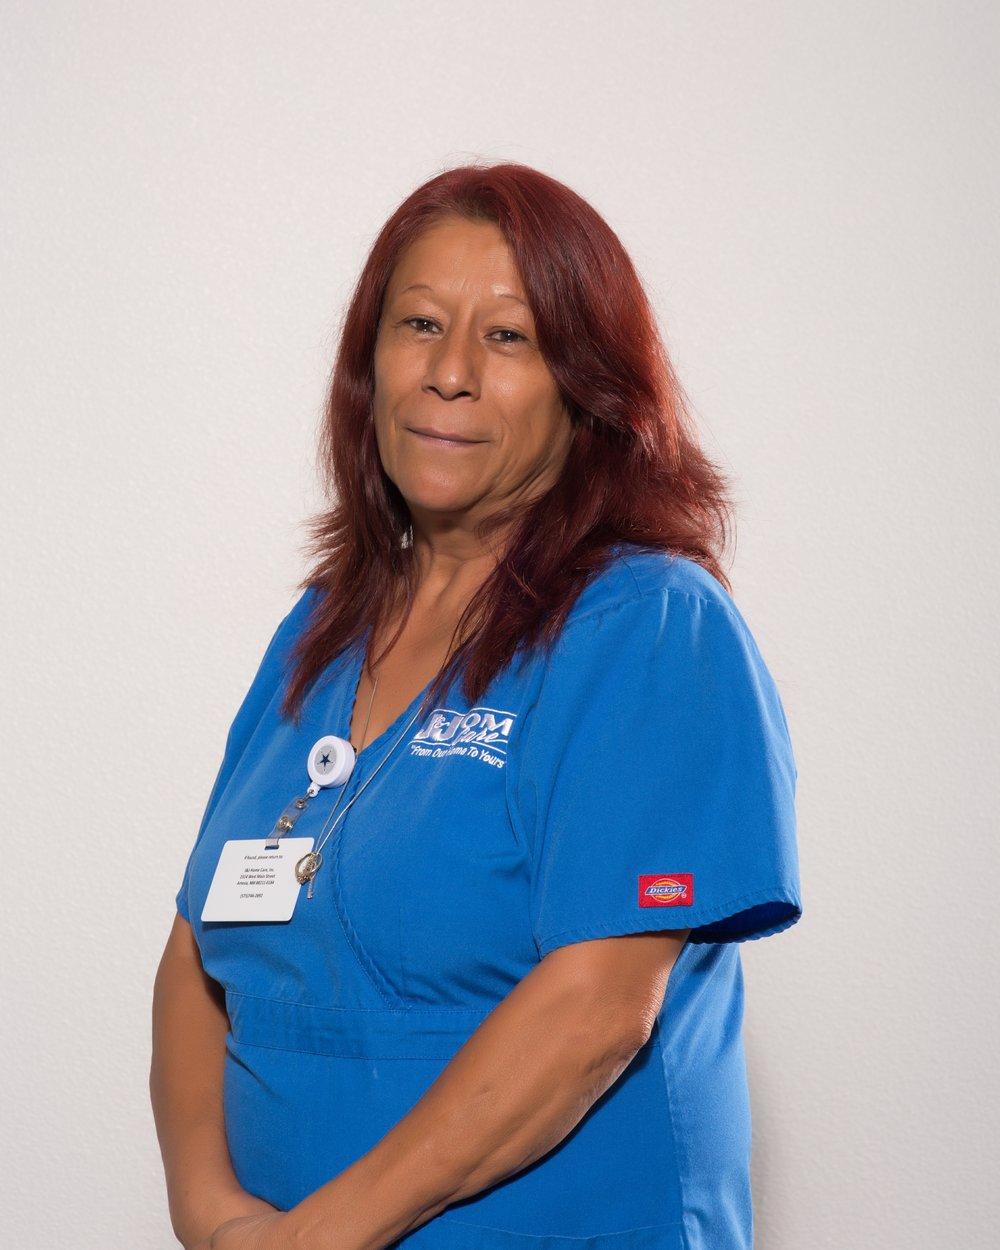 Stella Rodriquez  CNA / Home Health Aide